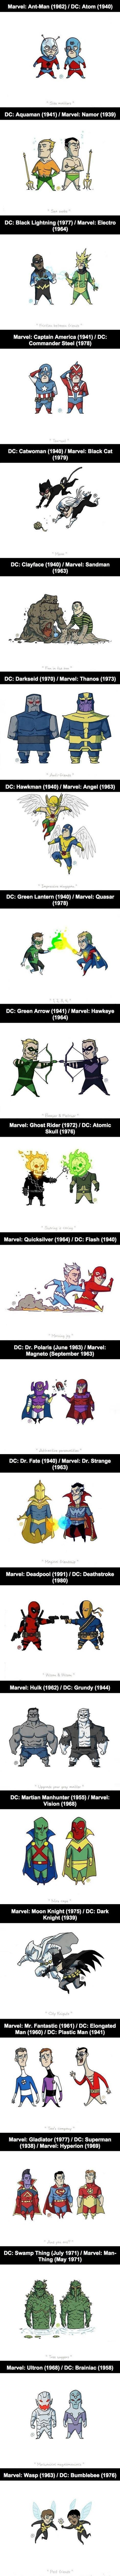 DC vs Marvel. source: I don't know. Marvel: Antwuan (1962) I DC: Atom (1940) DC: Aquaman (1941) I Marvel: Namor (1939) DC: Black Lightning (1917) I Marvel: Elec